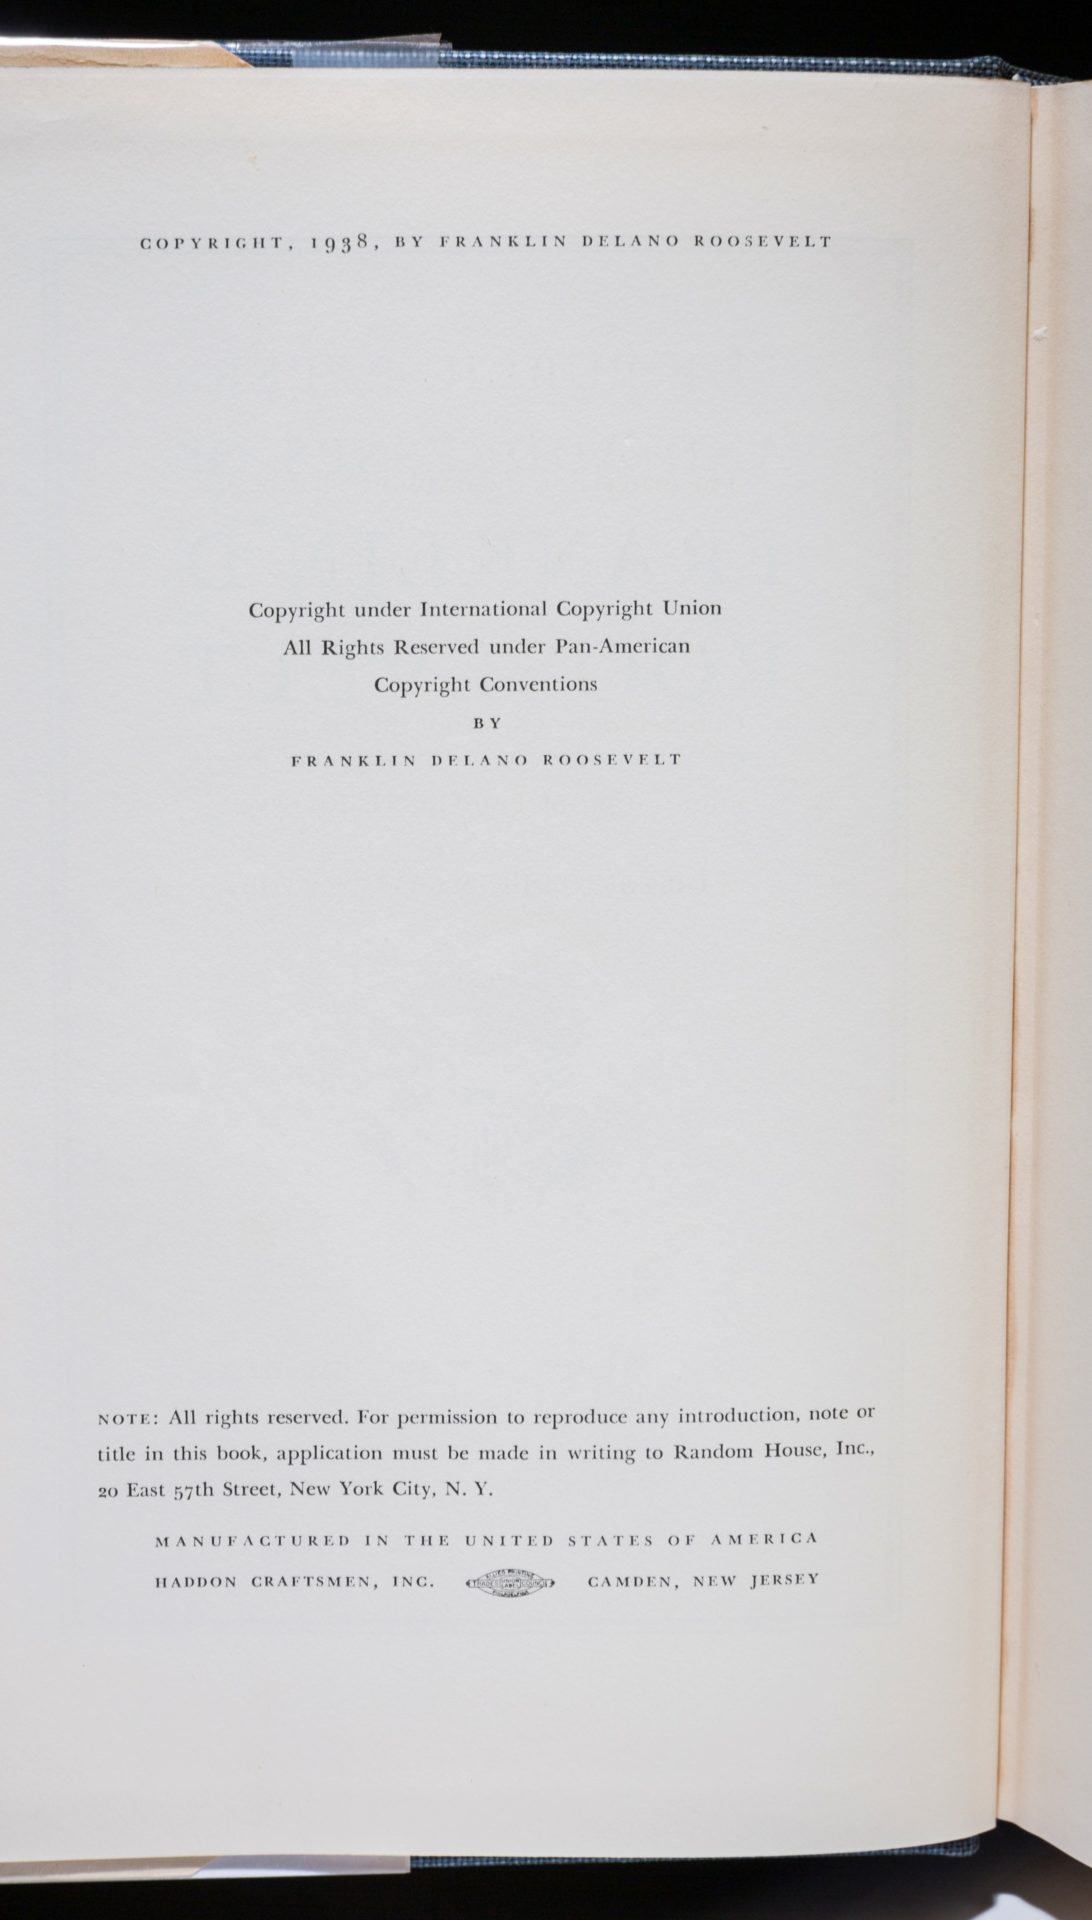 Ap environmental released essays